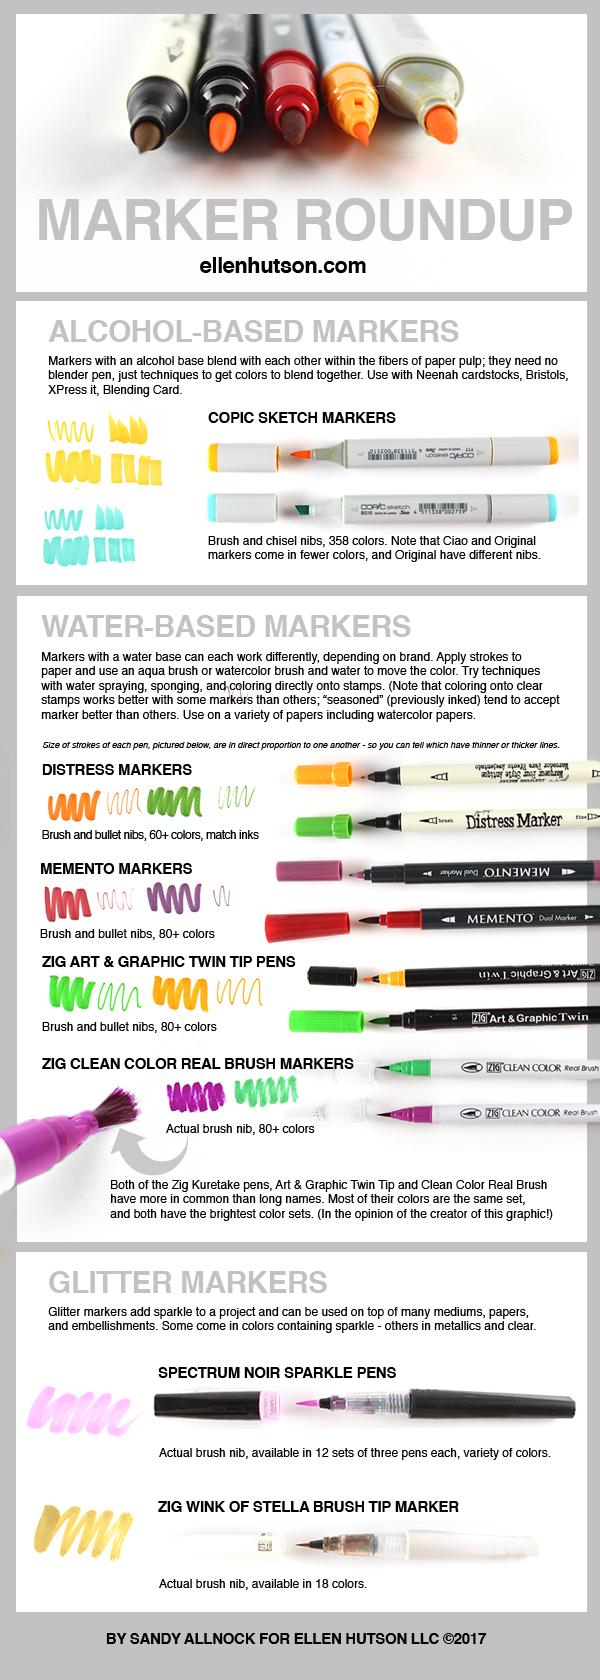 Marker roundup